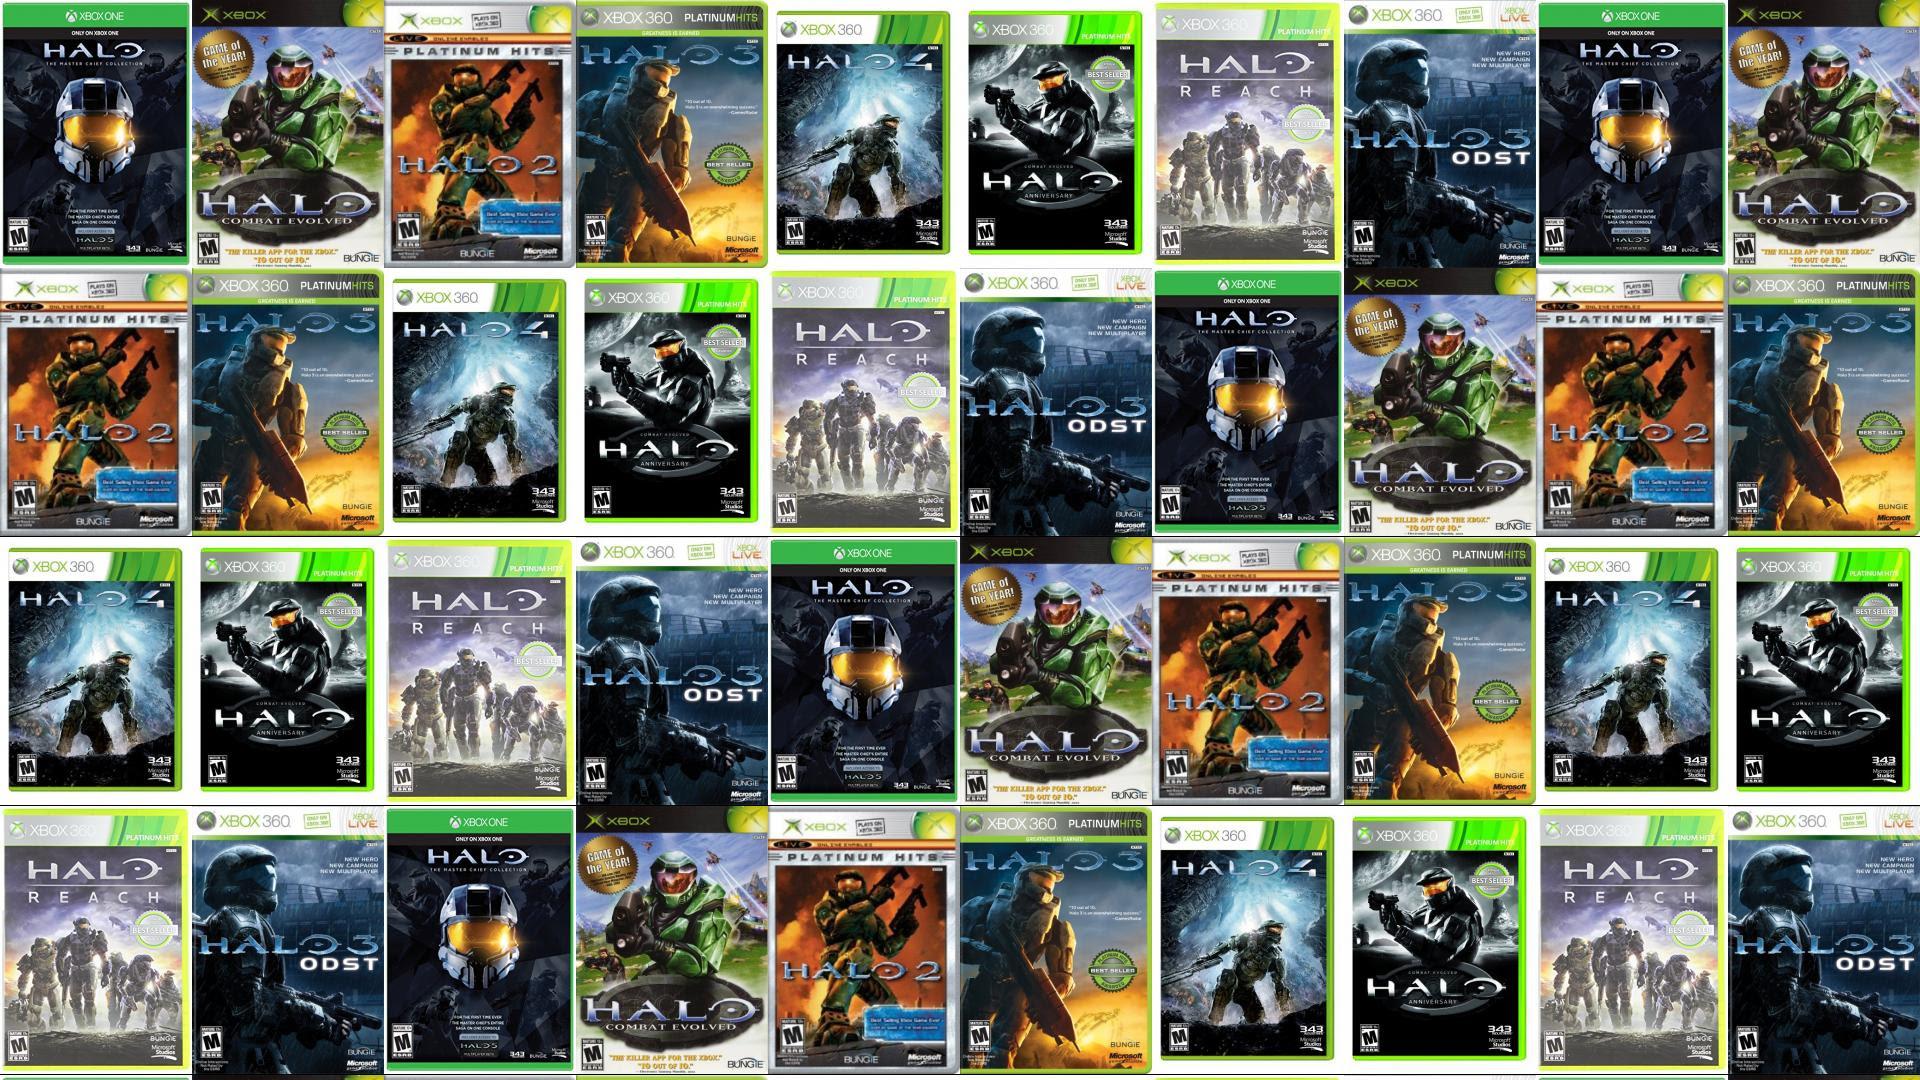 Halo 2 Tiled Desktop Wallpaper